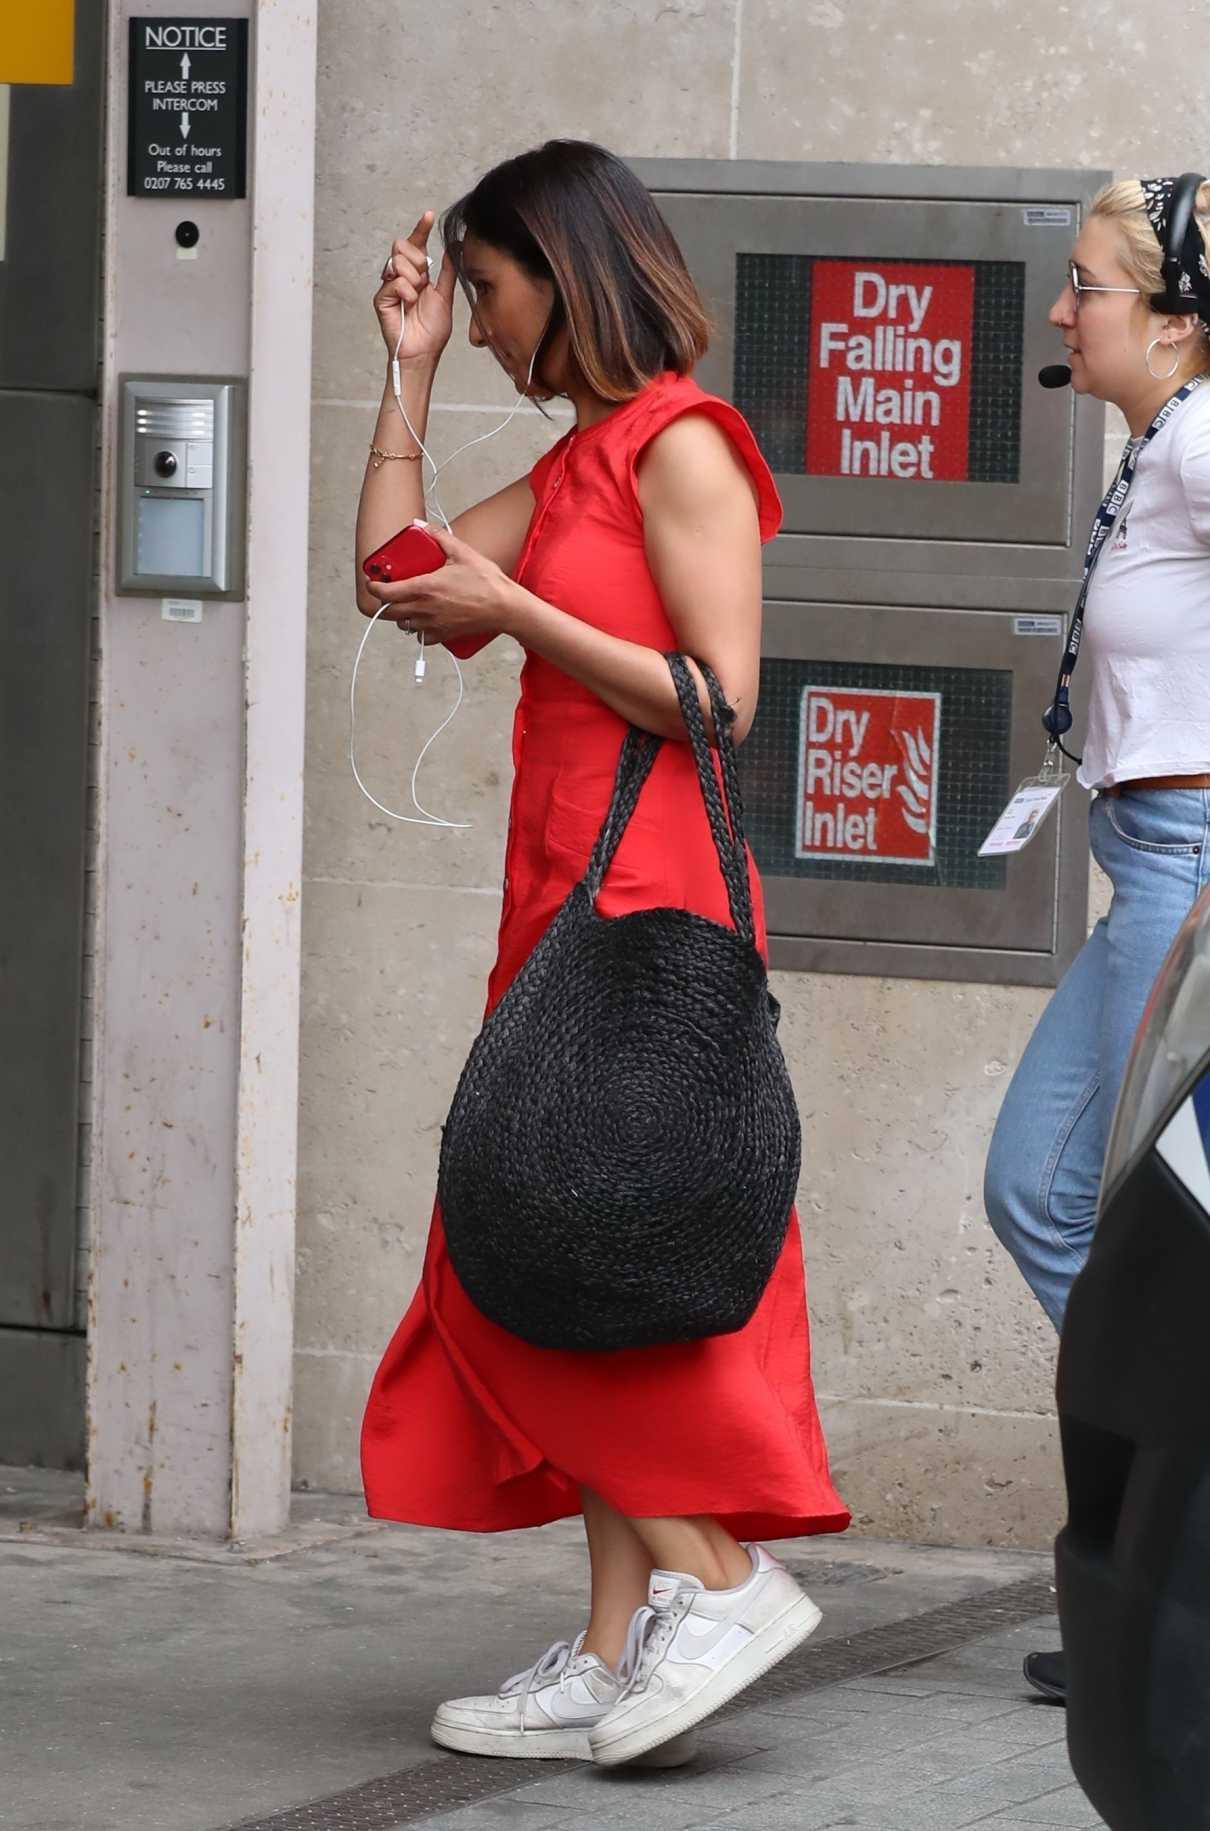 Life Size Cutout Red Dress Details about  /Anita Rani